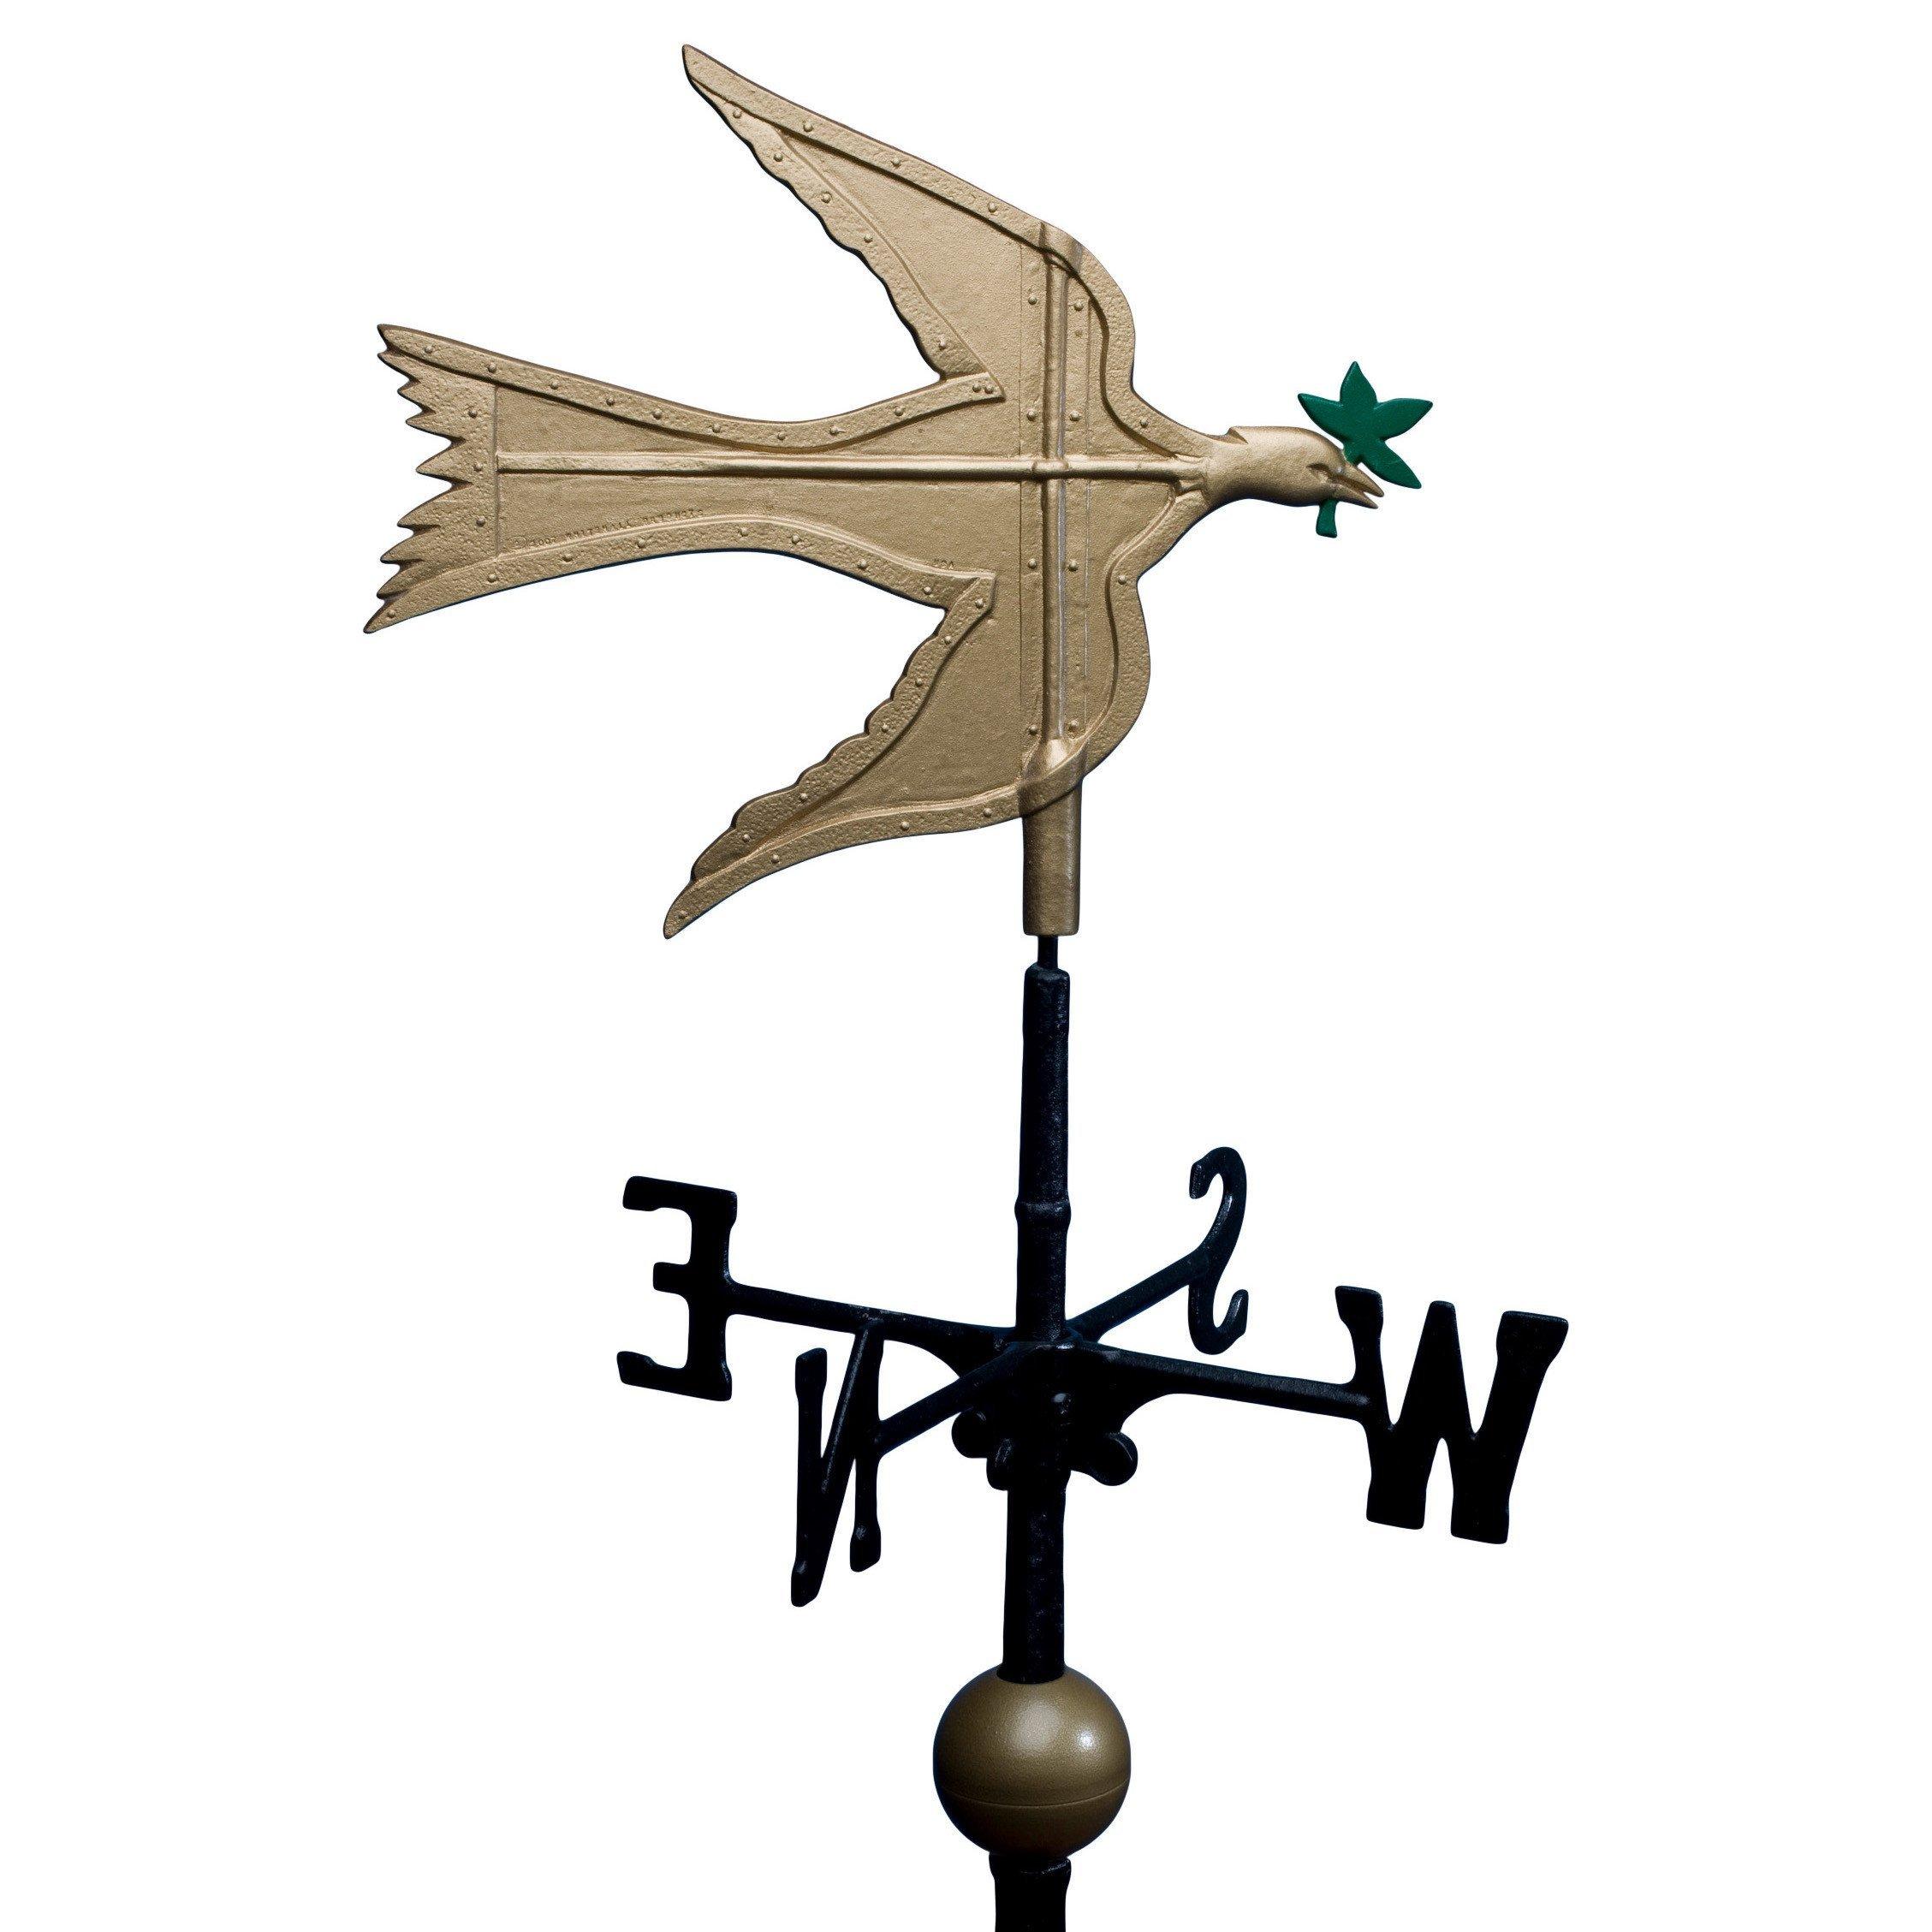 George Washington's Mount Vernon Dove of Peace Weathervane